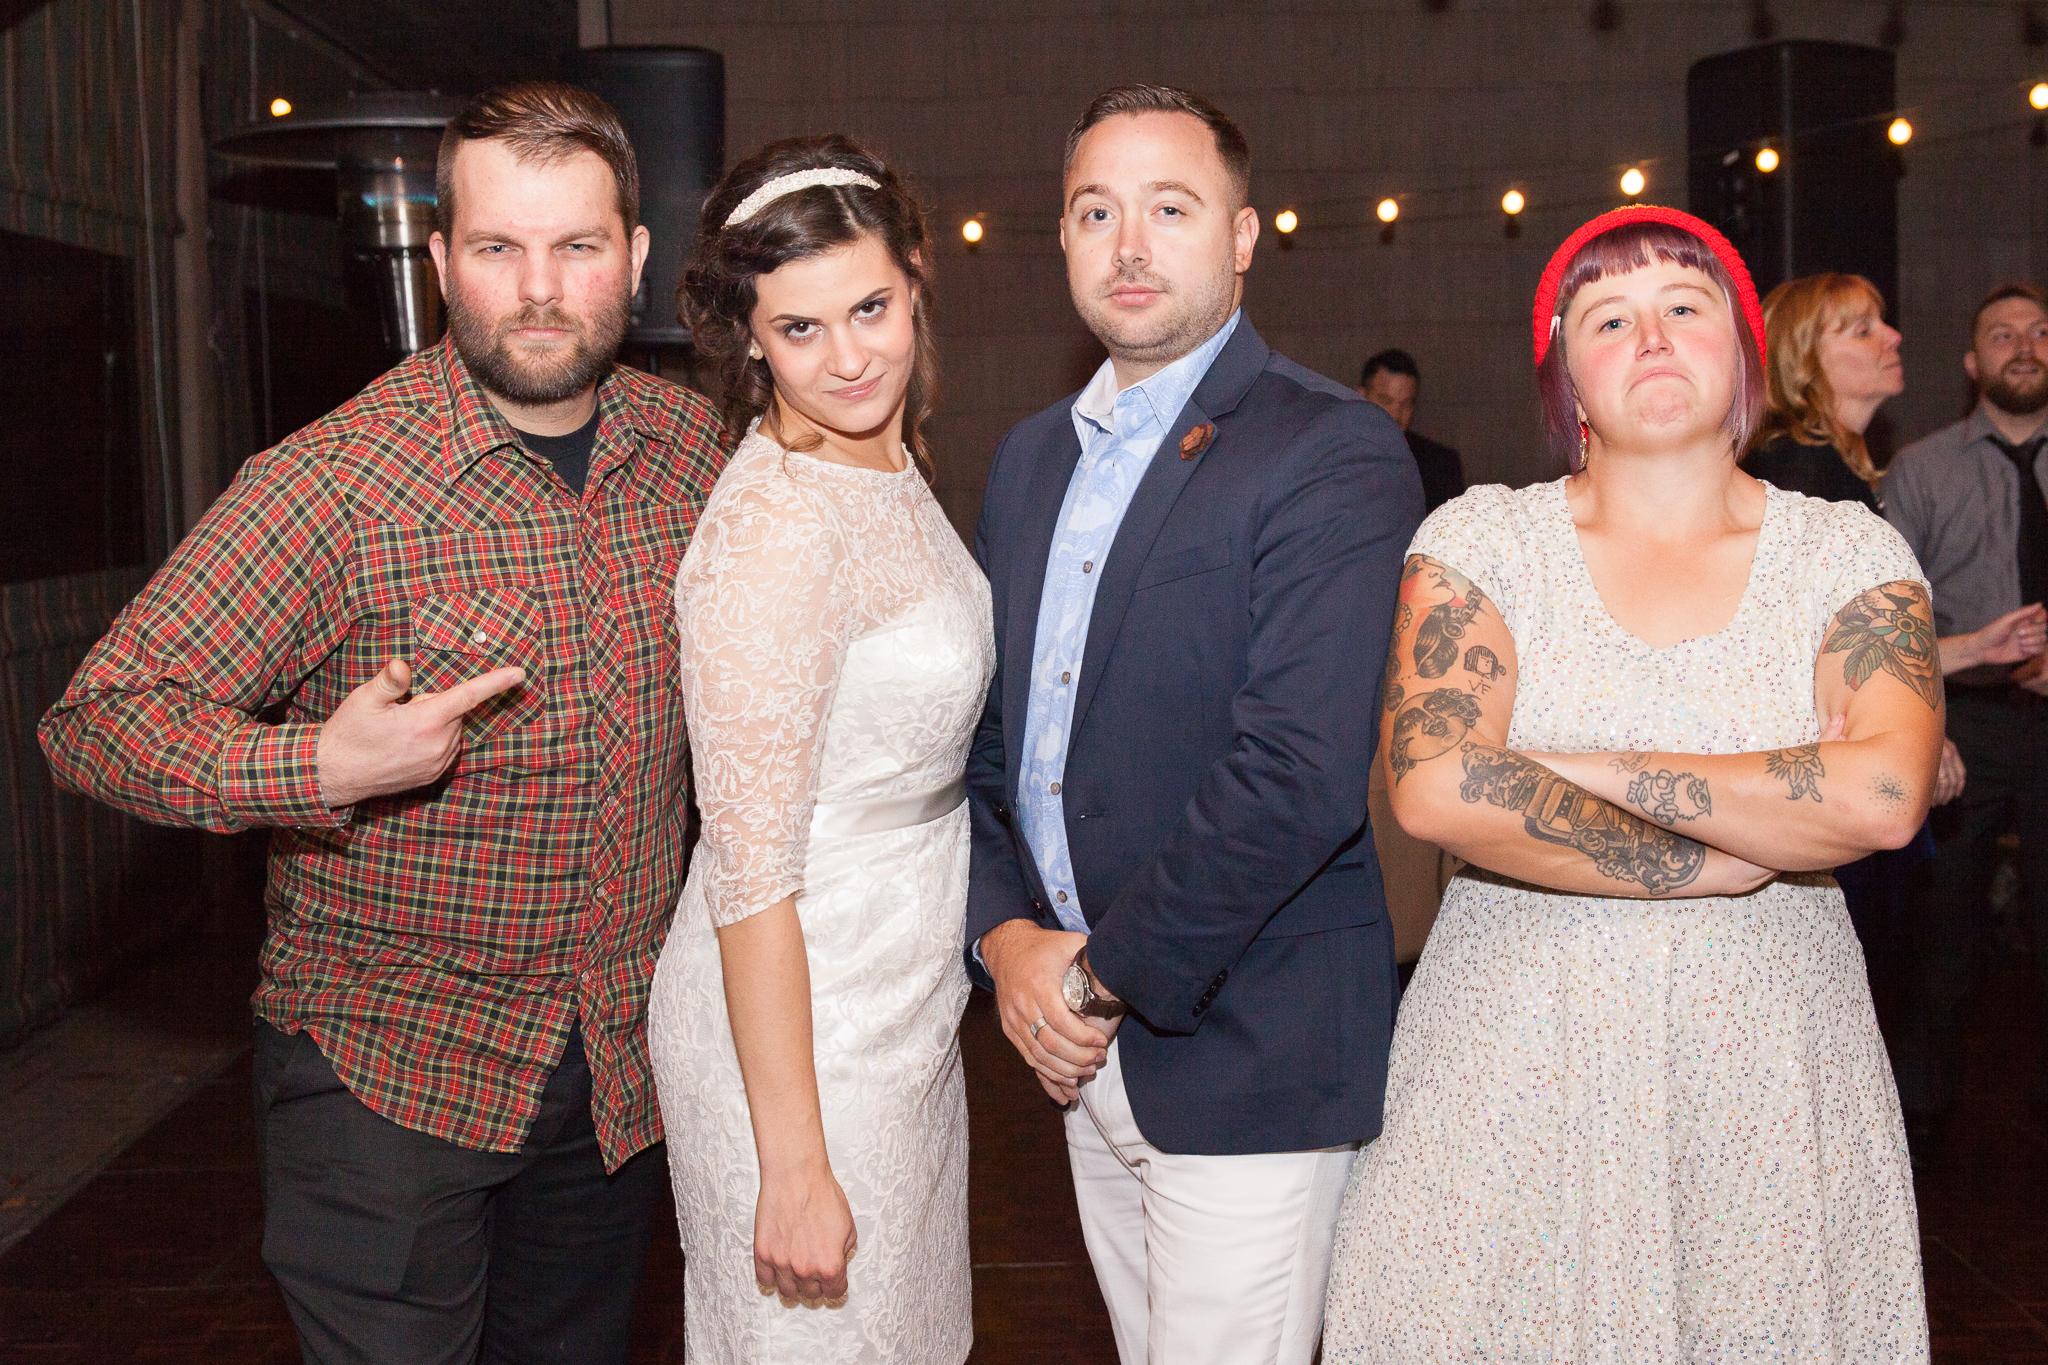 camuglia-whomstudio-chelsea_and_andy-nycphotographer-wedding-brooklyn-buffalo-timberlodge-183-1277.jpg